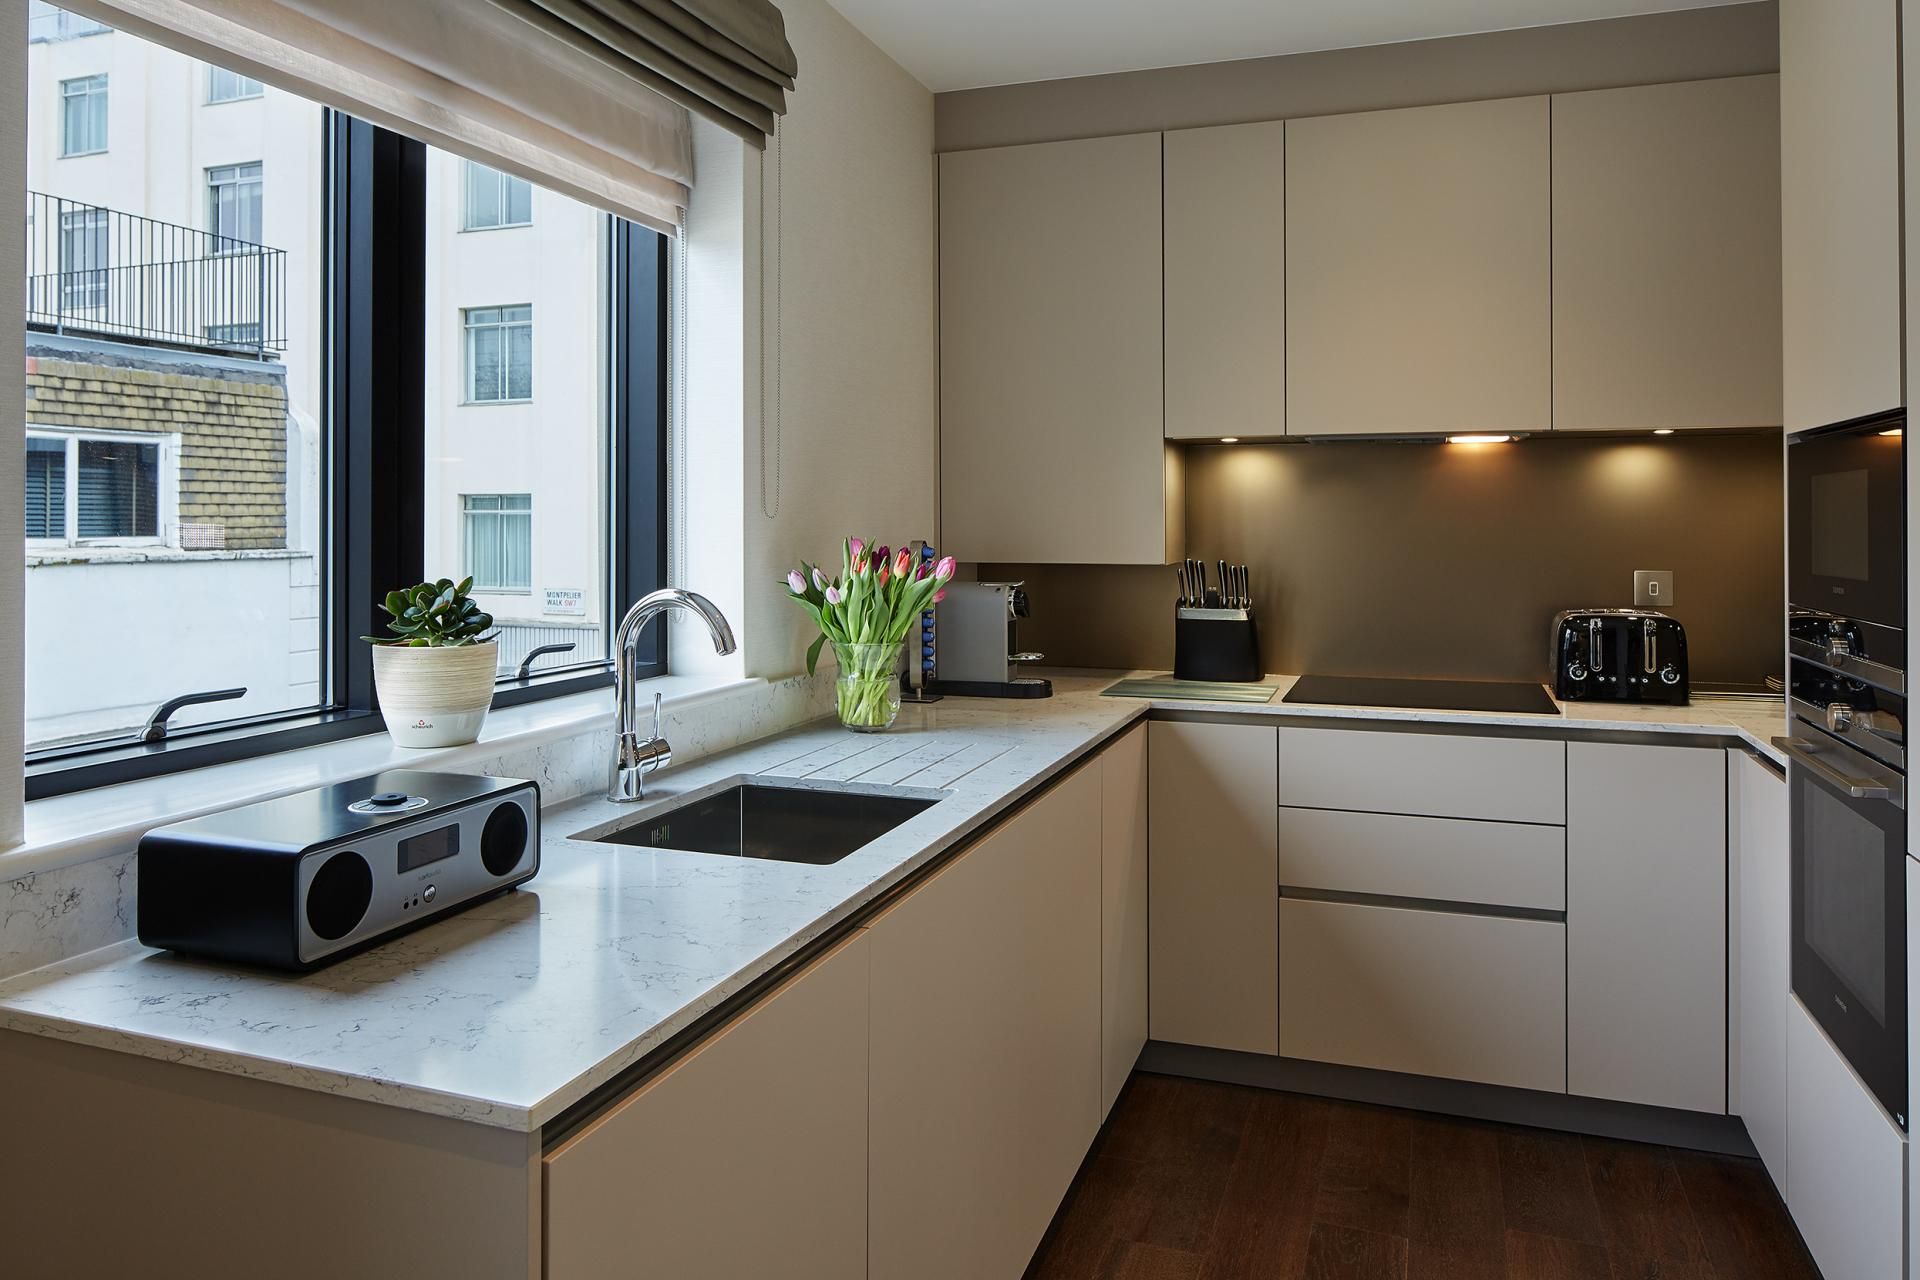 Kitchen at 29-31 Cheval Place Apartments, Knightsbridge, London - Citybase Apartments